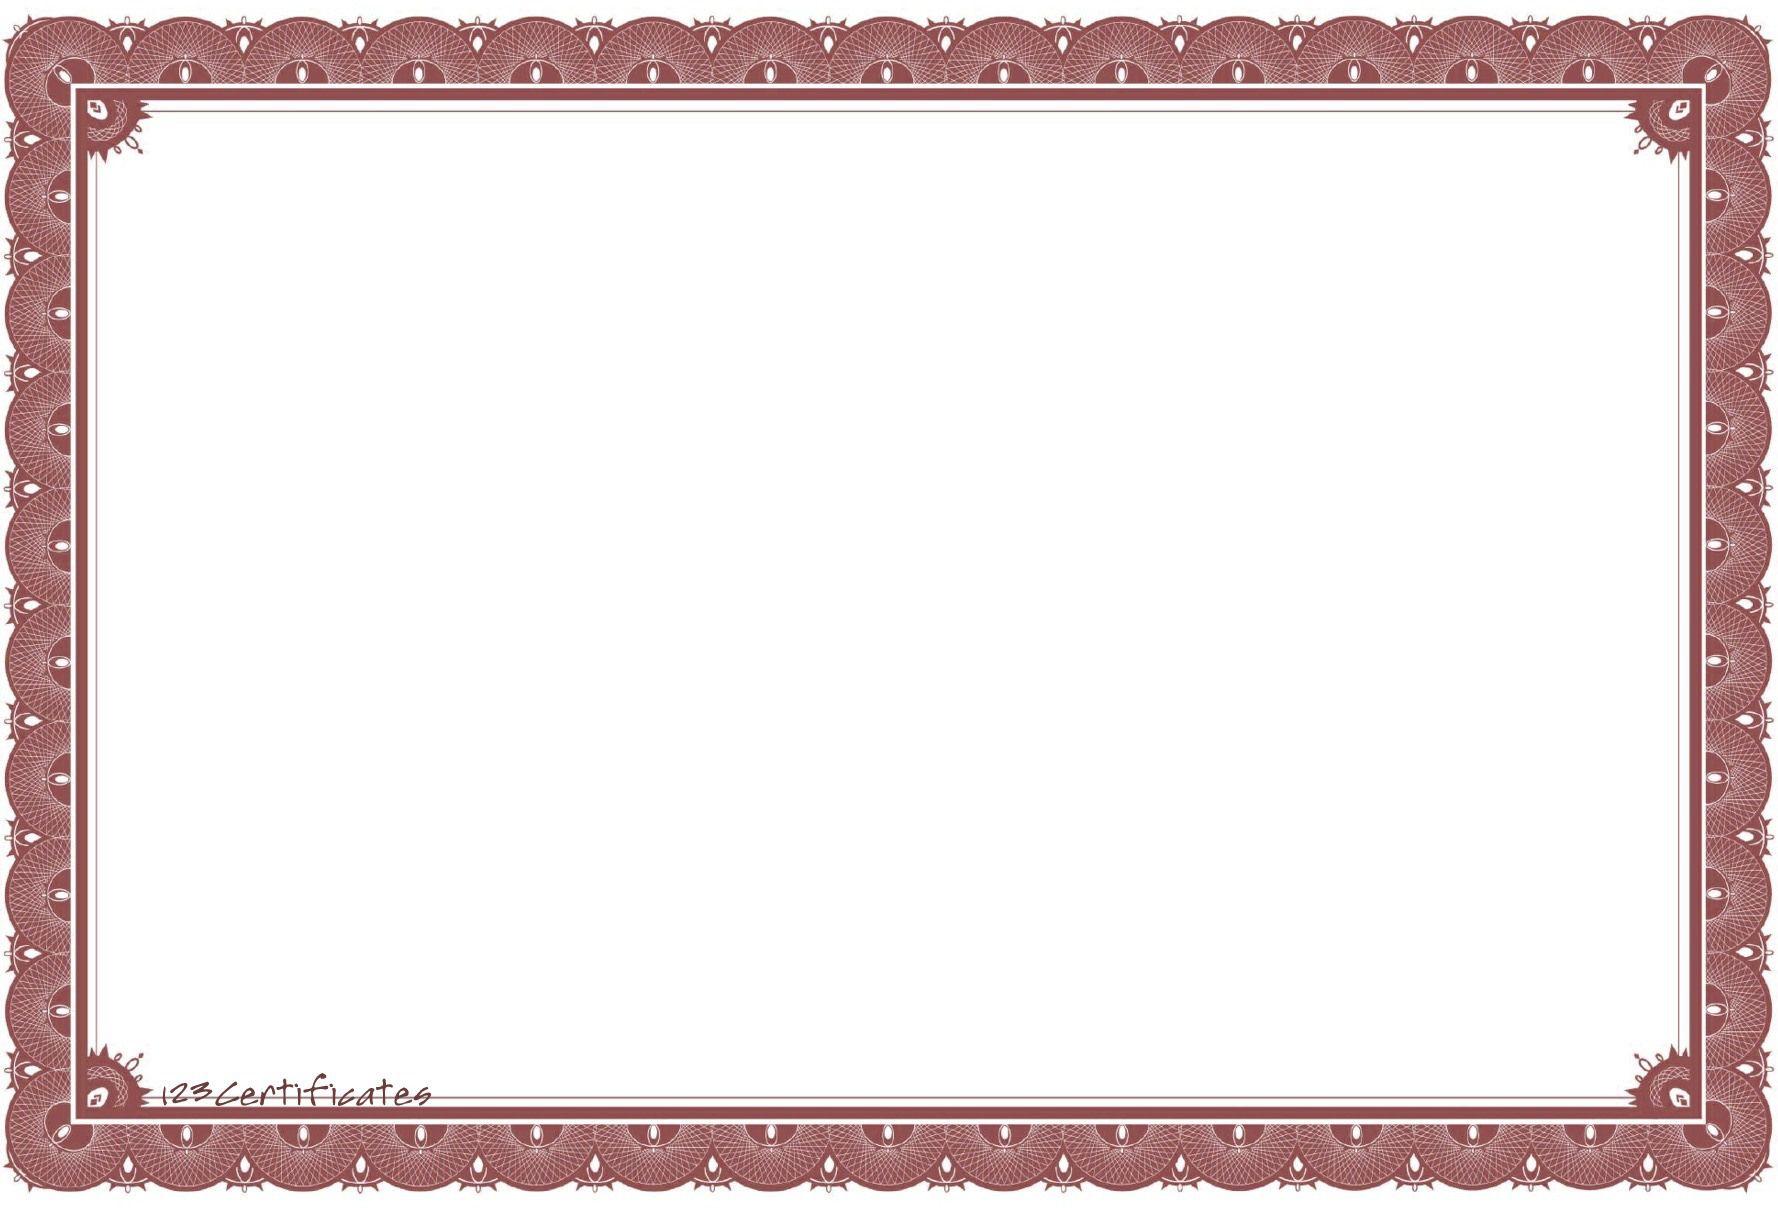 Free Printable Preschool Award Certificates. Certificate Borders ...